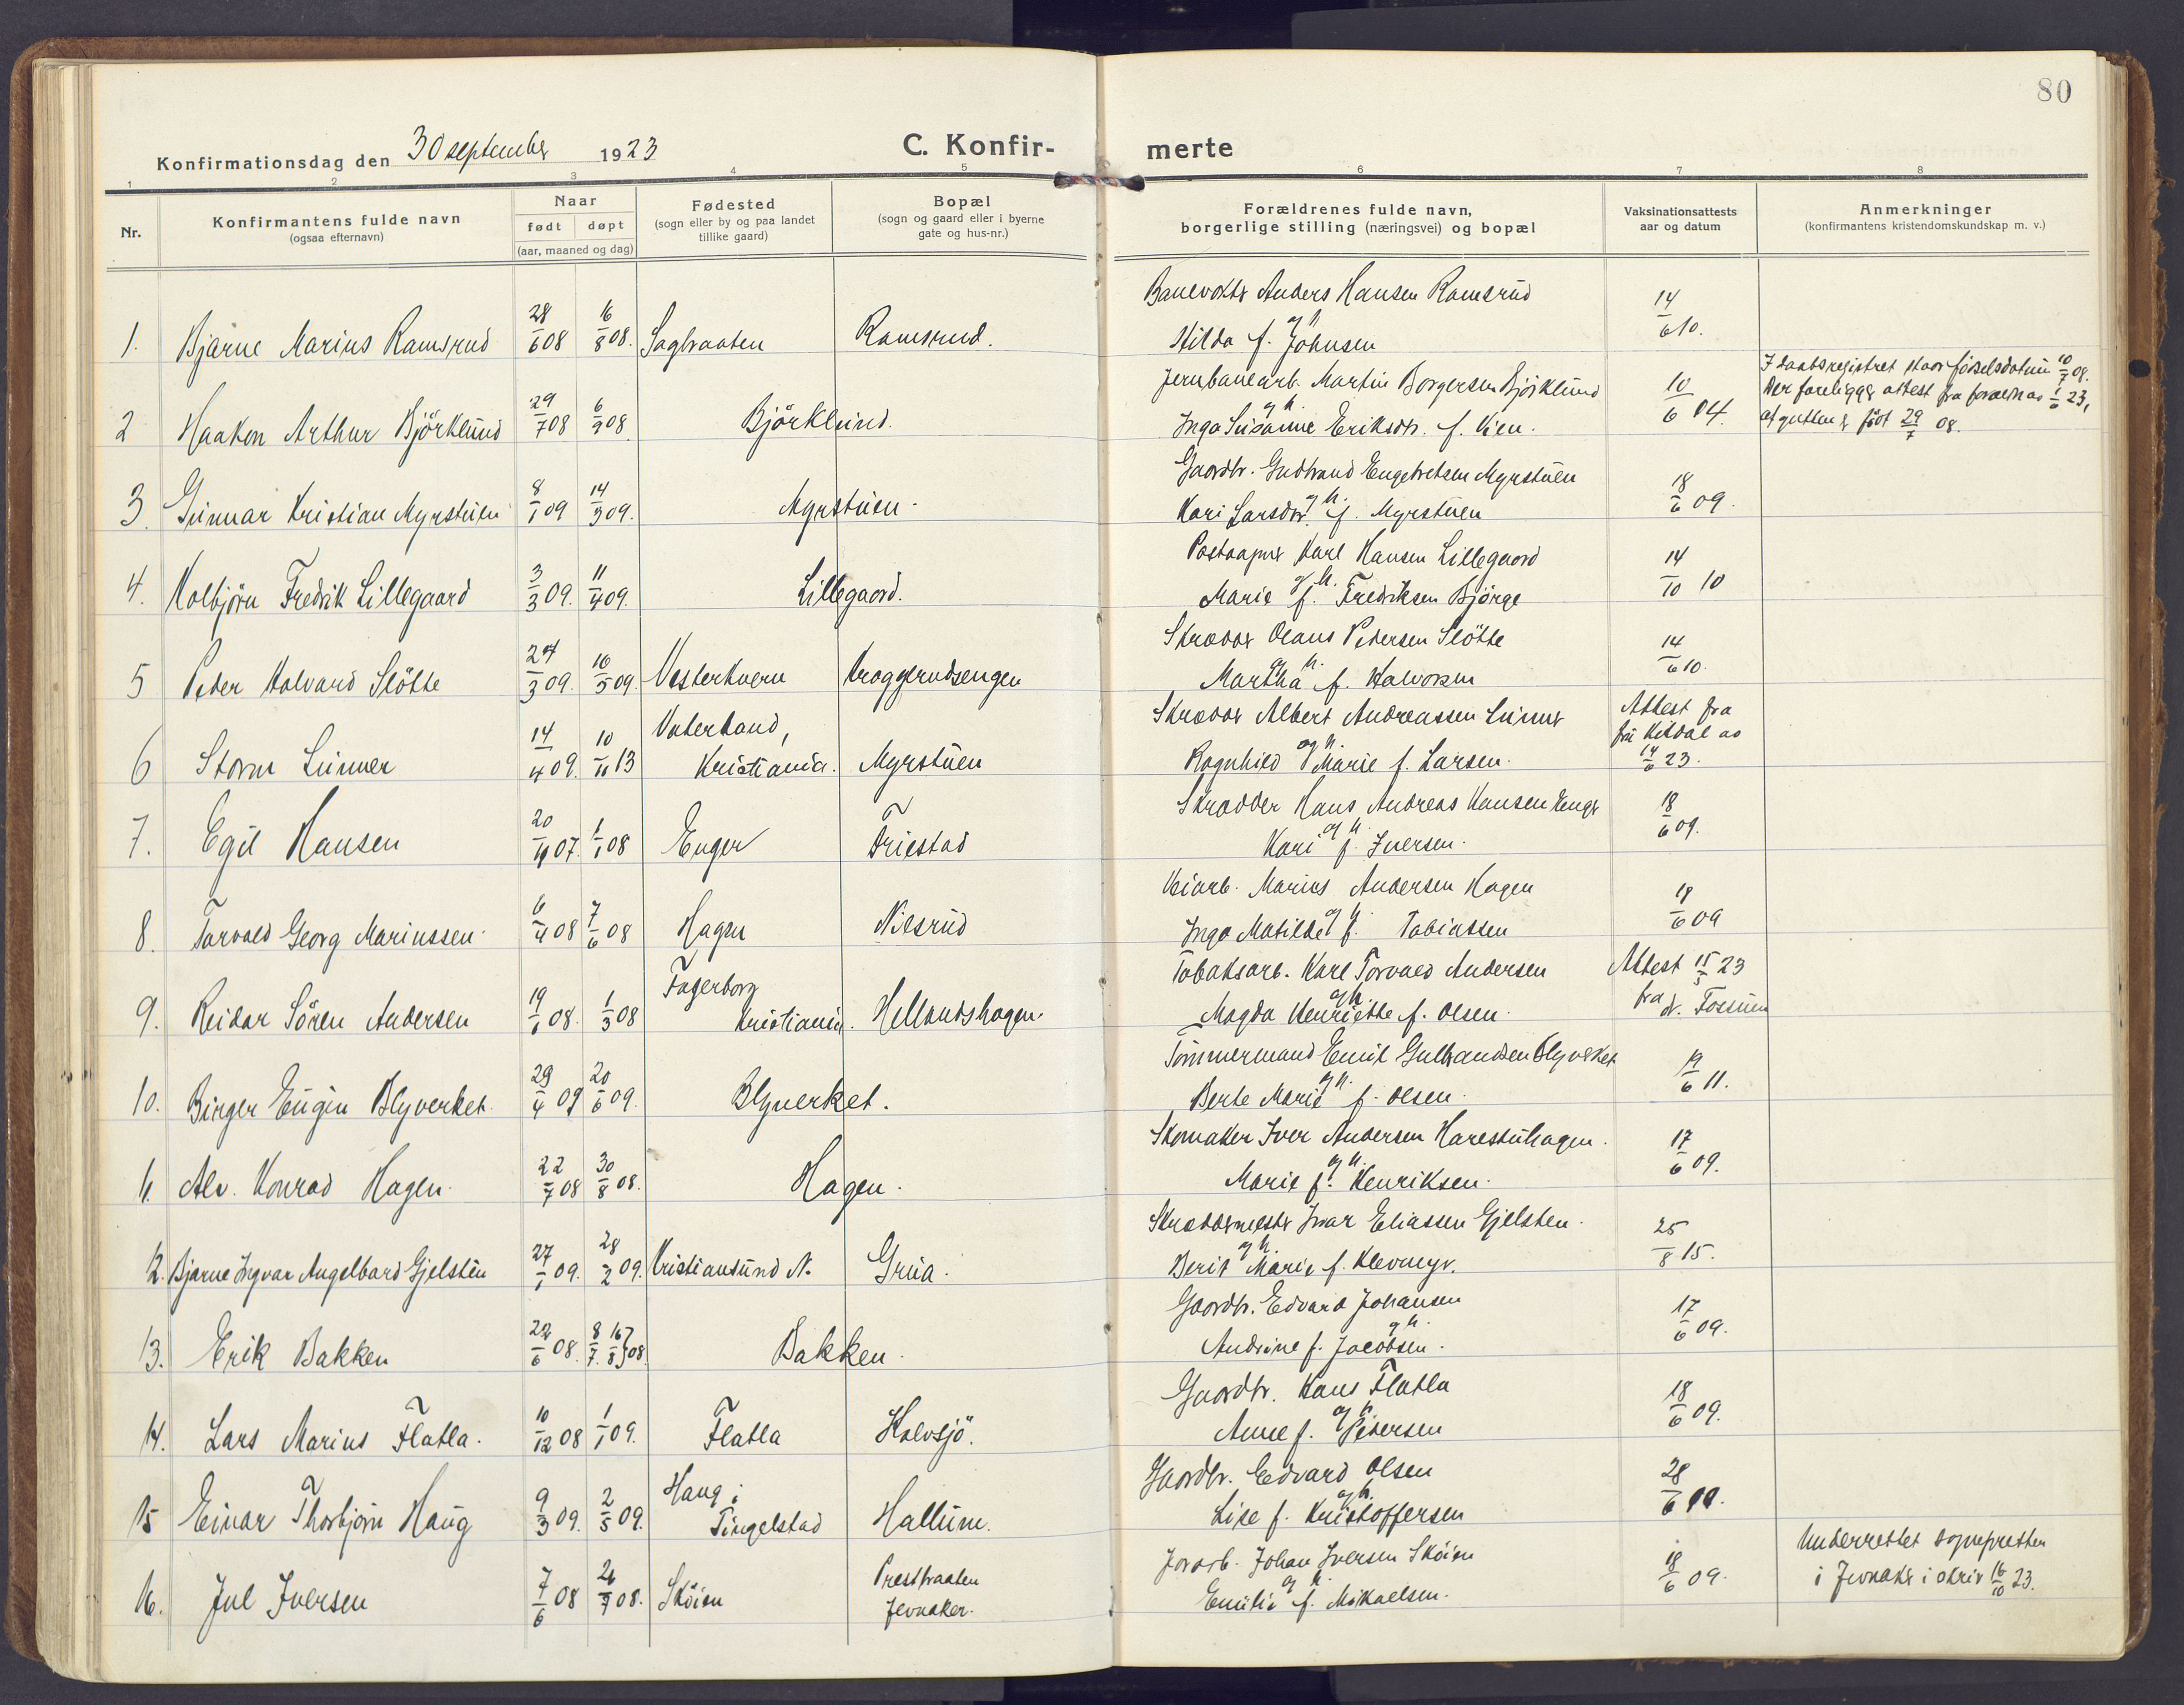 SAH, Lunner prestekontor, H/Ha/Haa/L0002: Ministerialbok nr. 2, 1922-1931, s. 80